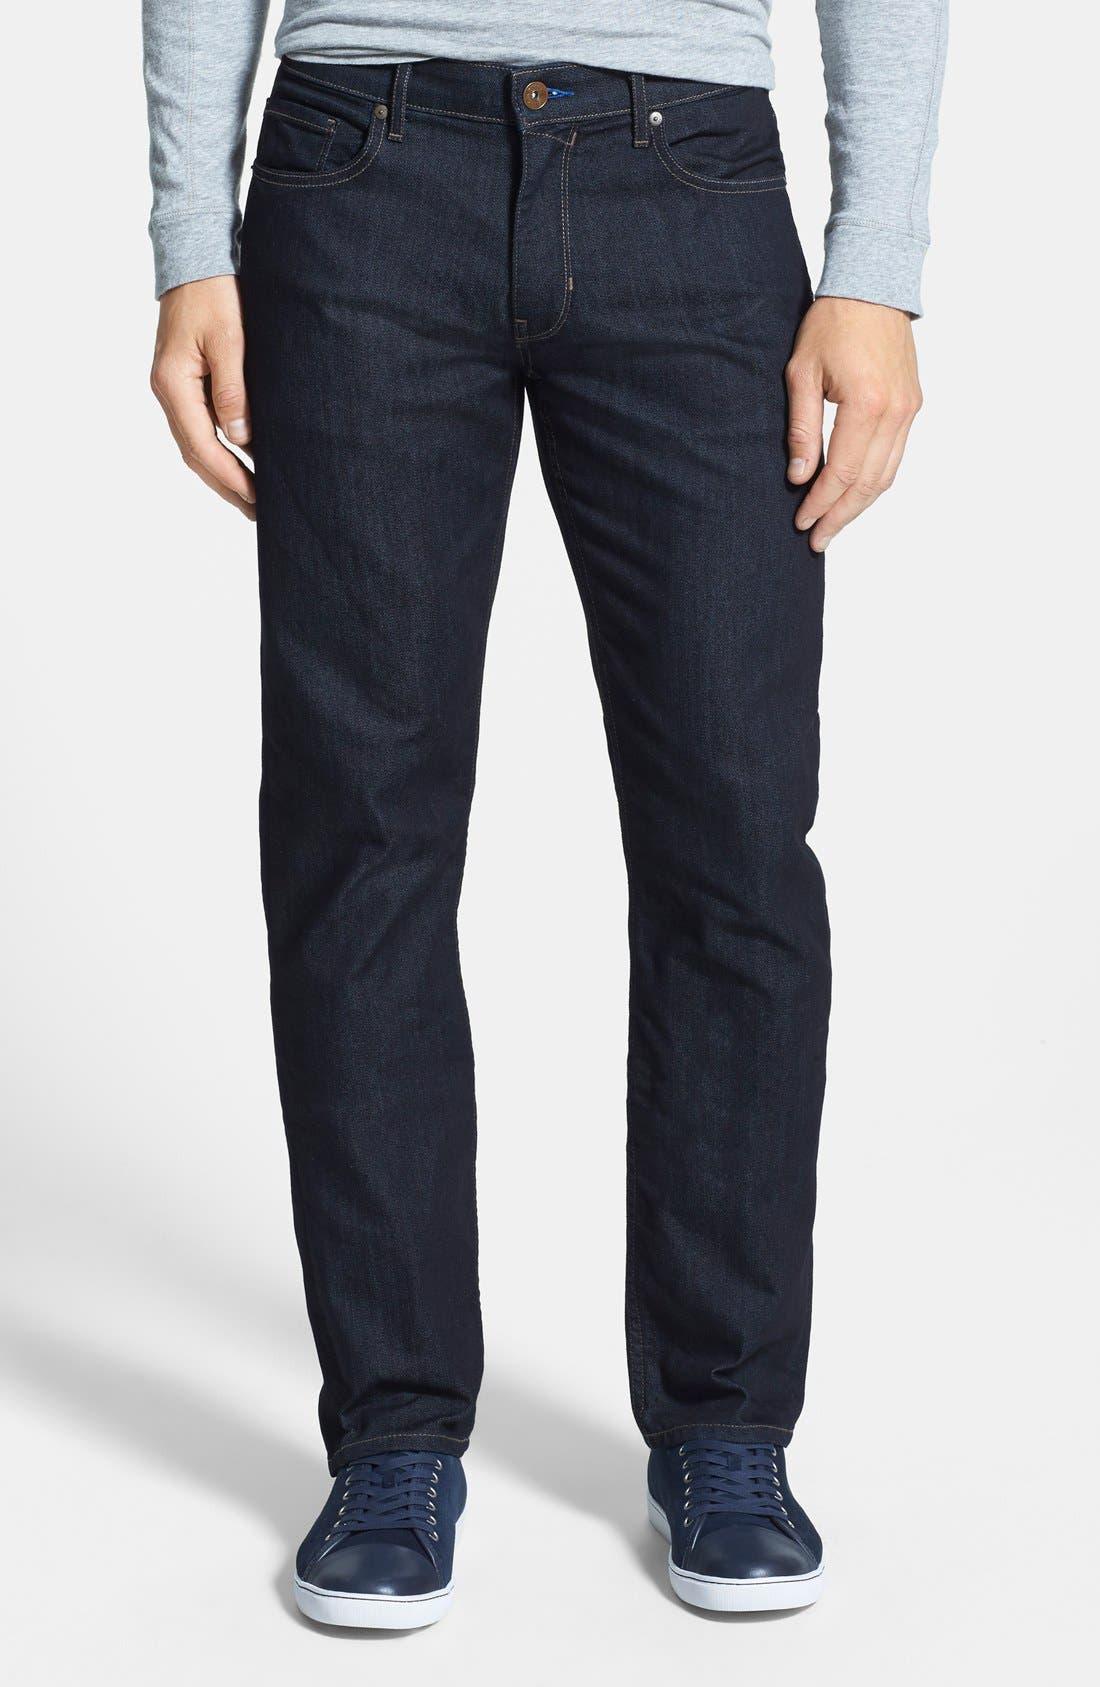 'Normandie' Straight Leg Jeans,                         Main,                         color, 400